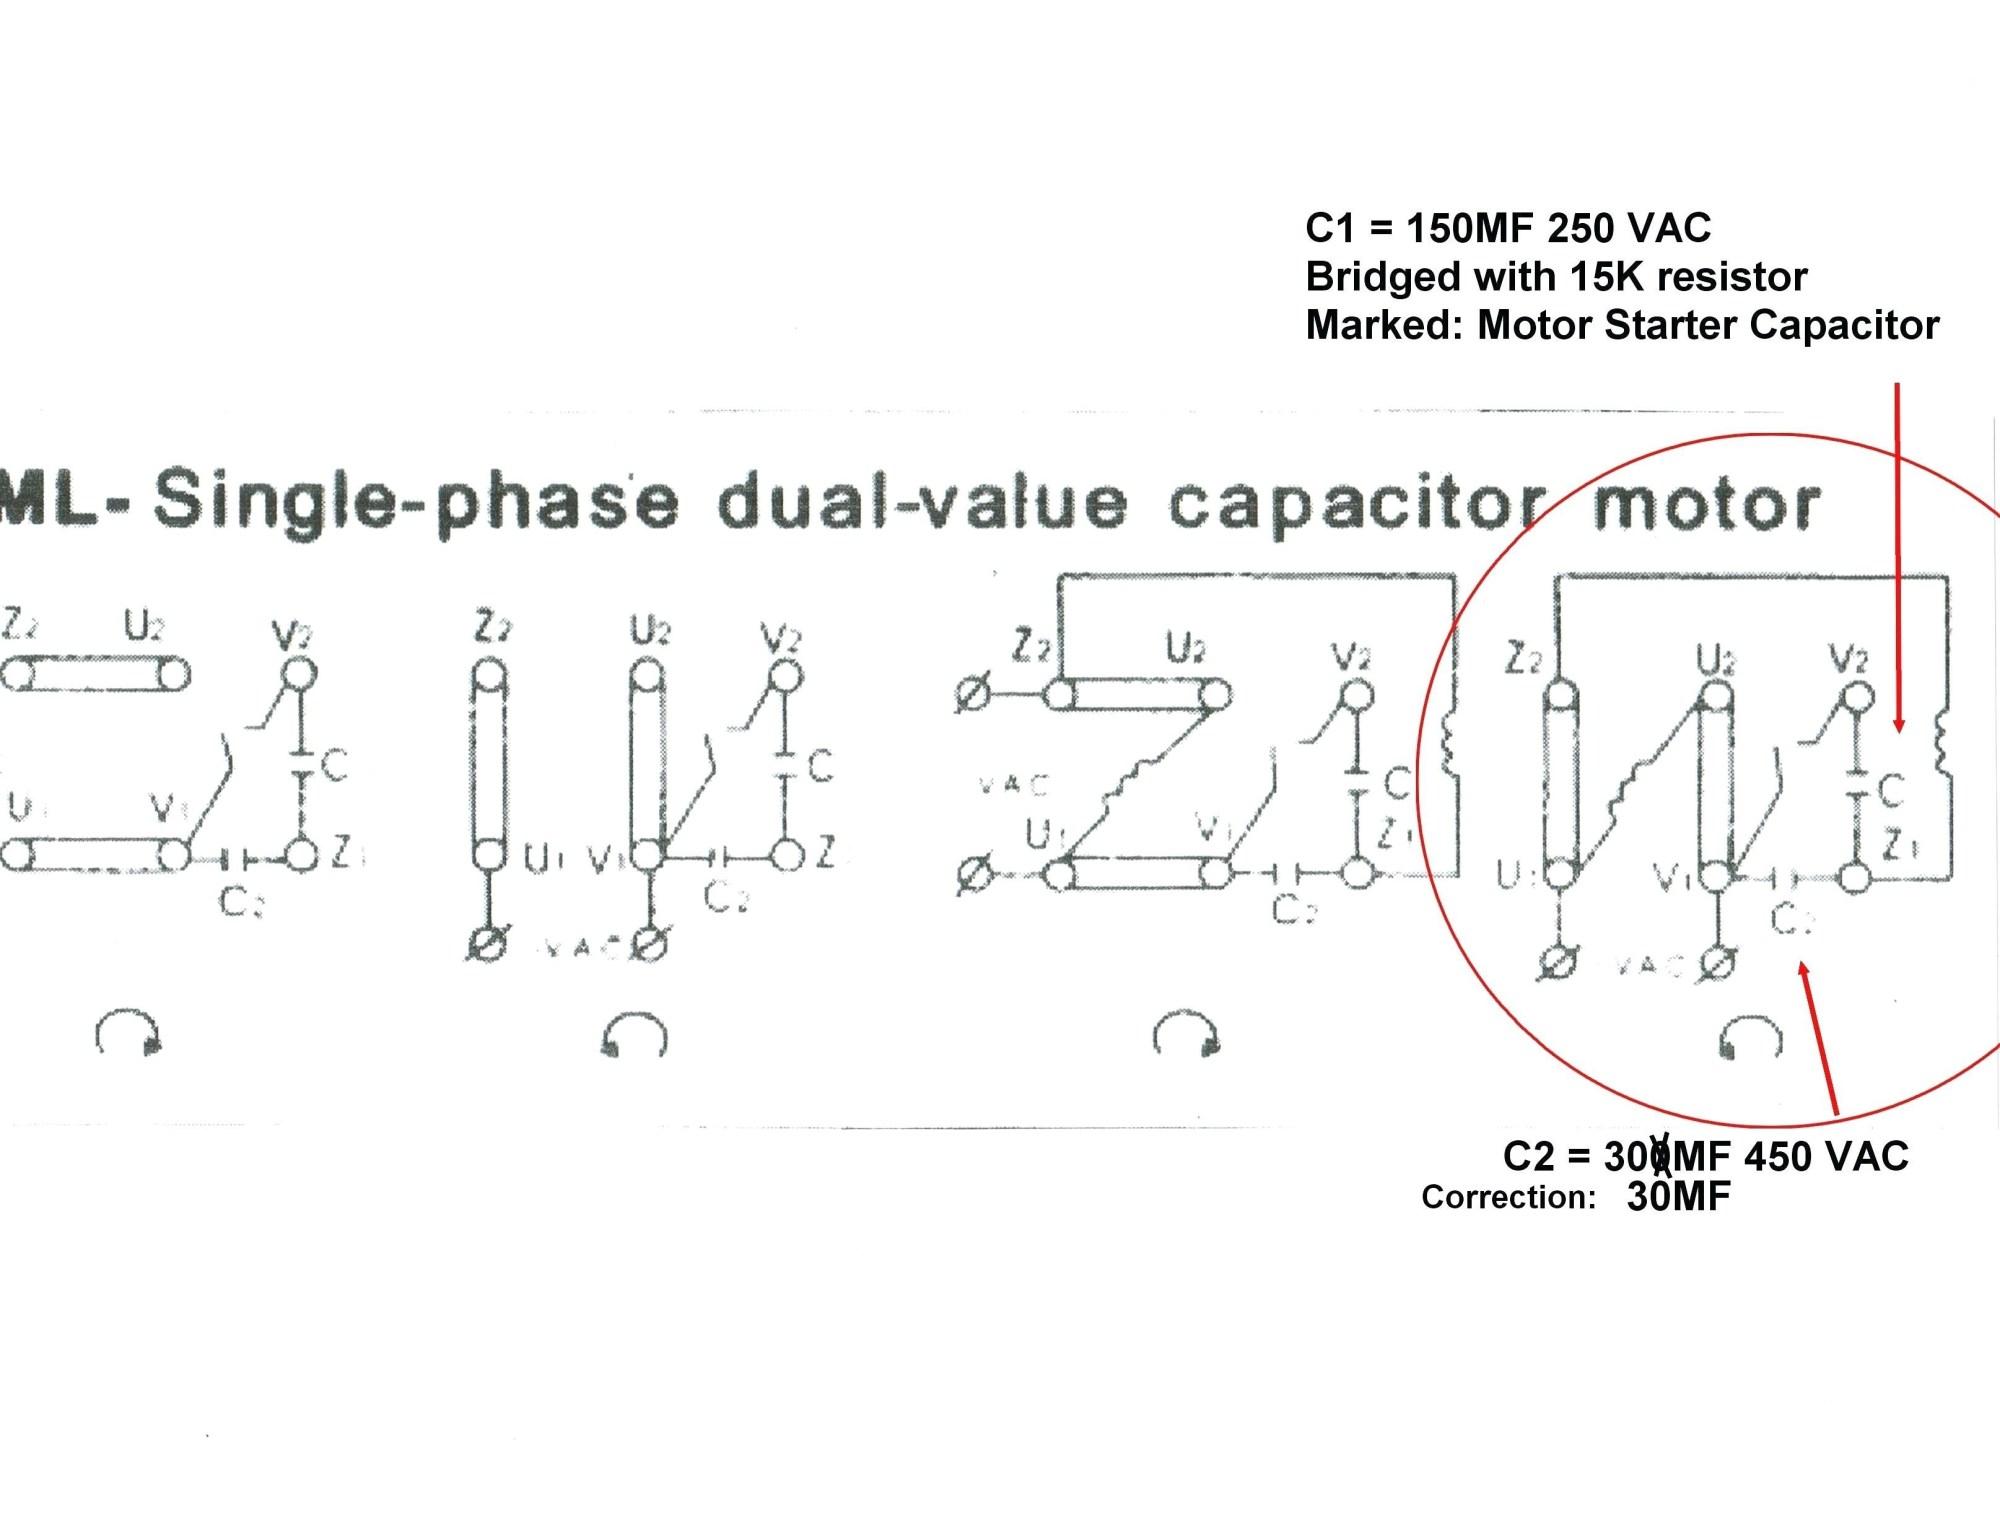 hight resolution of electric motor wiring diagram 110 to 220 free wiring diagram rh ricardolevinsmorales com single phase transformer wiring diagram single phase capacitor